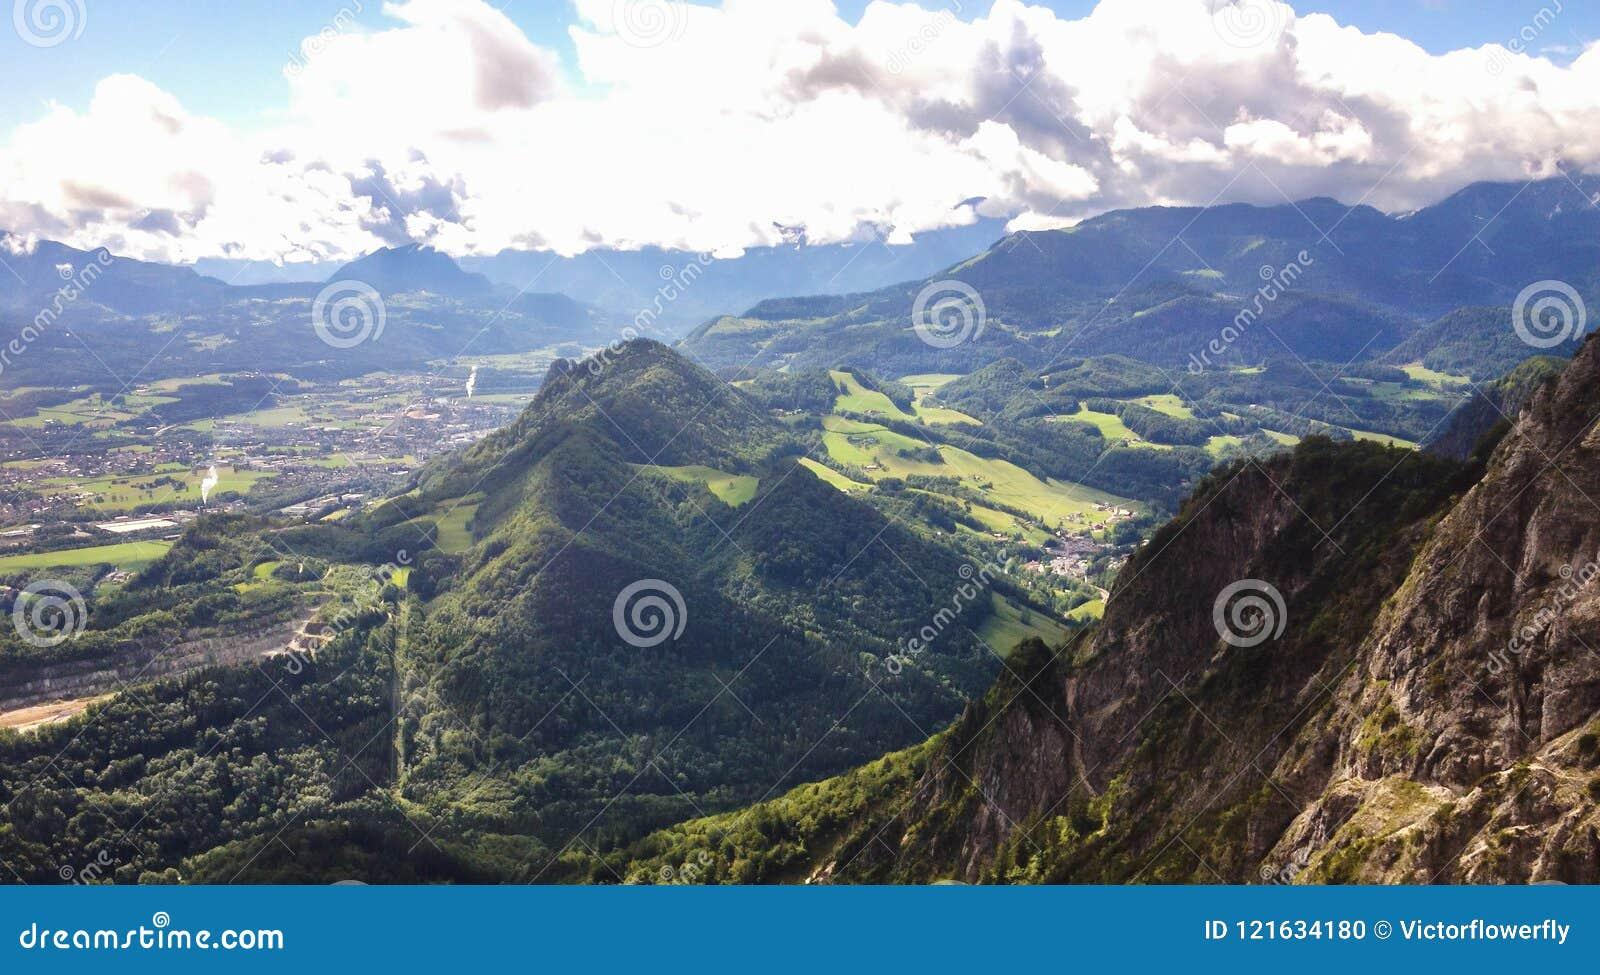 Lavabo Europa.Ajardine La Vista Del Lavabo De Salzburg Del Teleferico